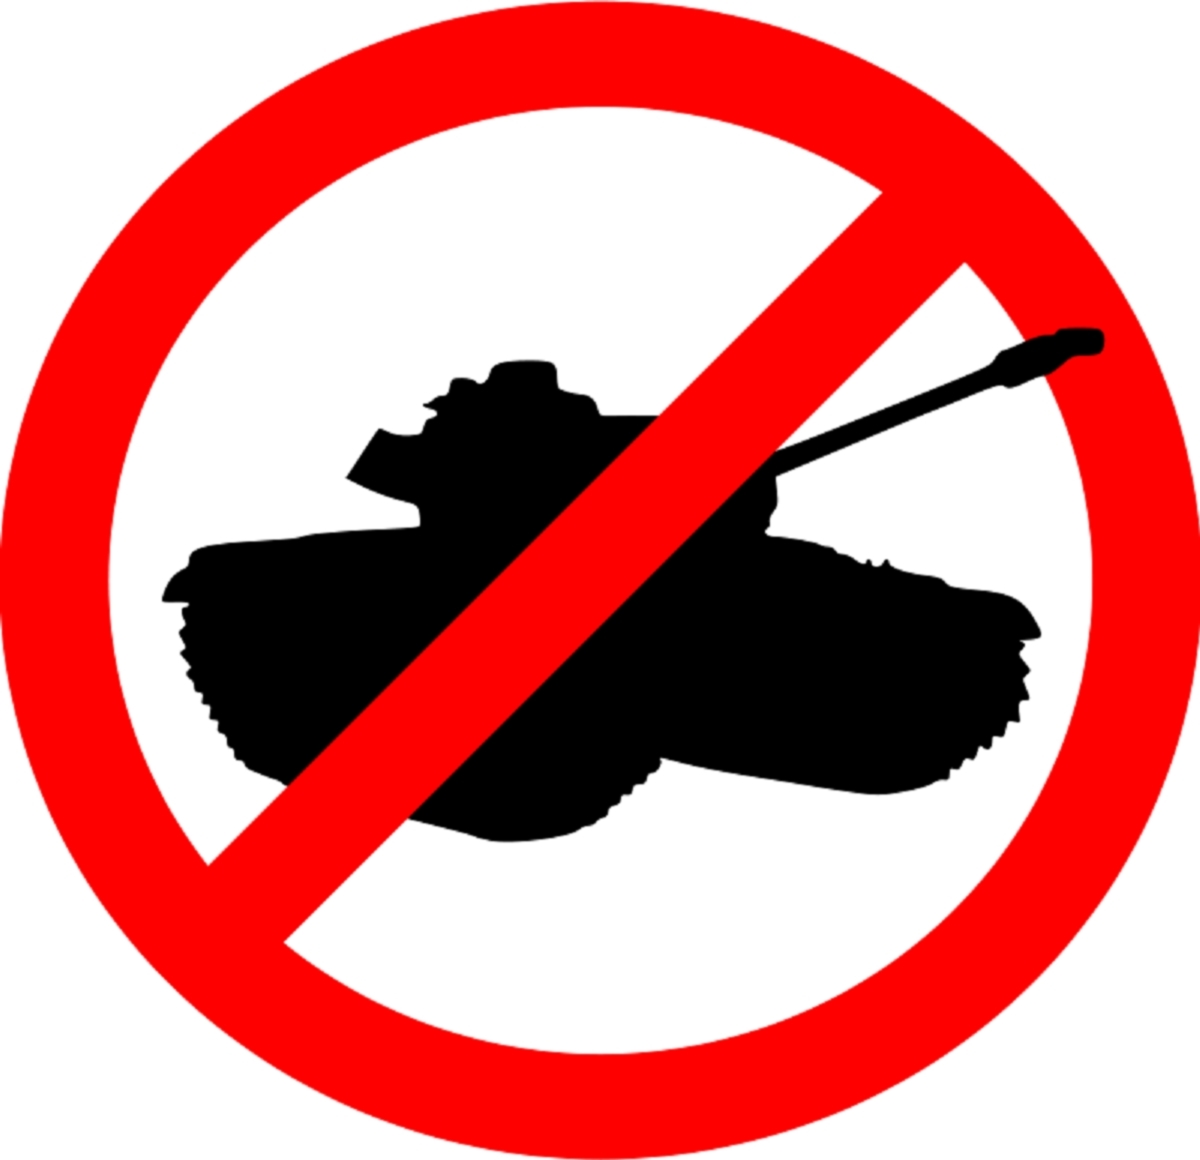 00 No tanks. 06.09.13